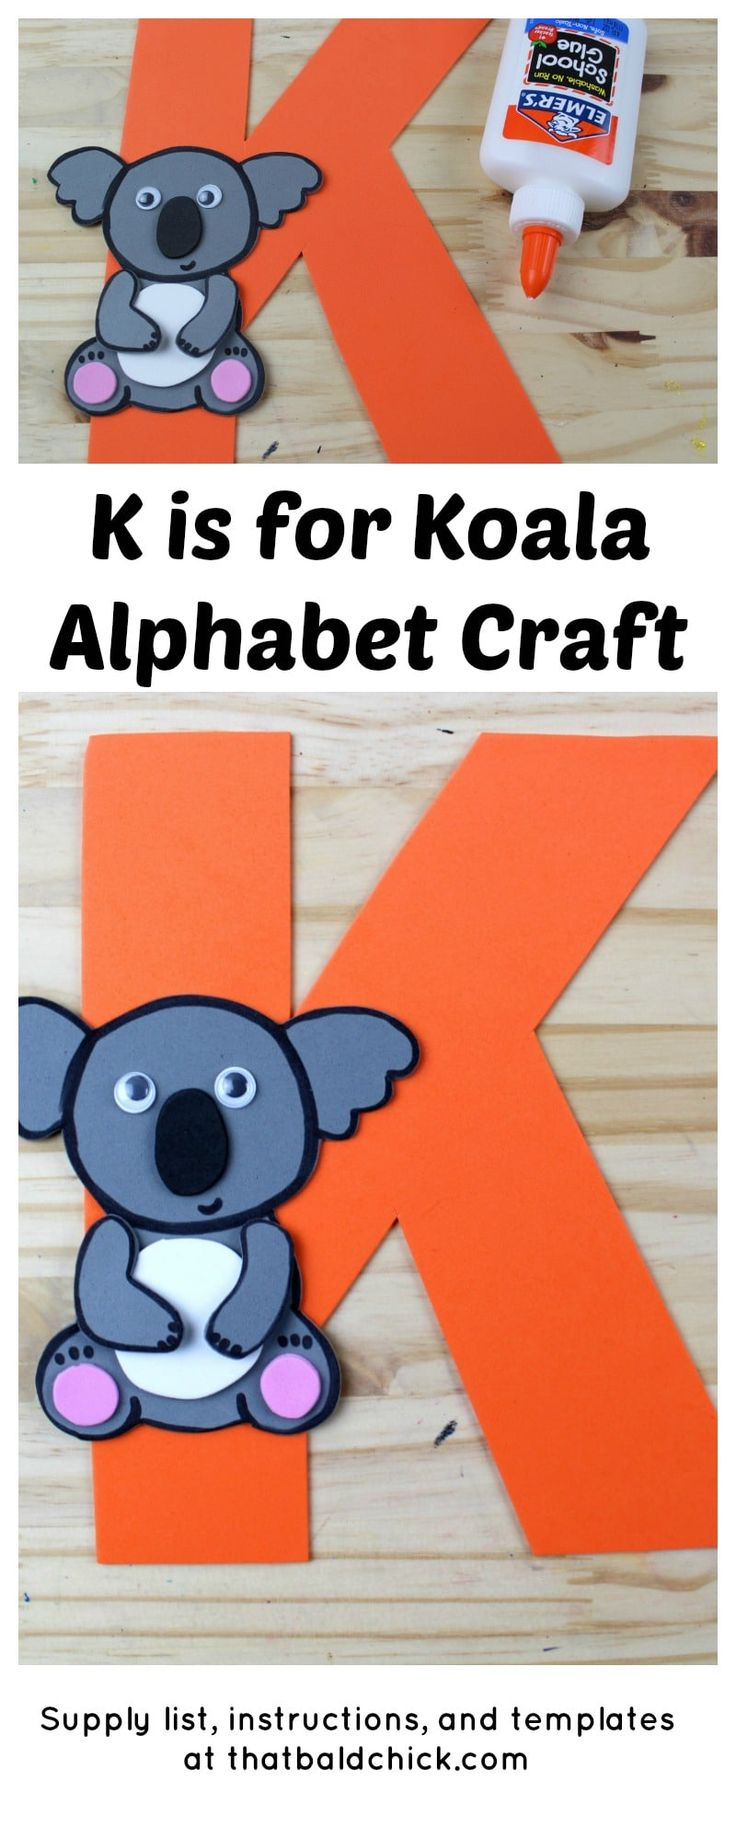 K is for Koala Alphabet Craft - supply list, instructions, and templates at thatbaldchick.com